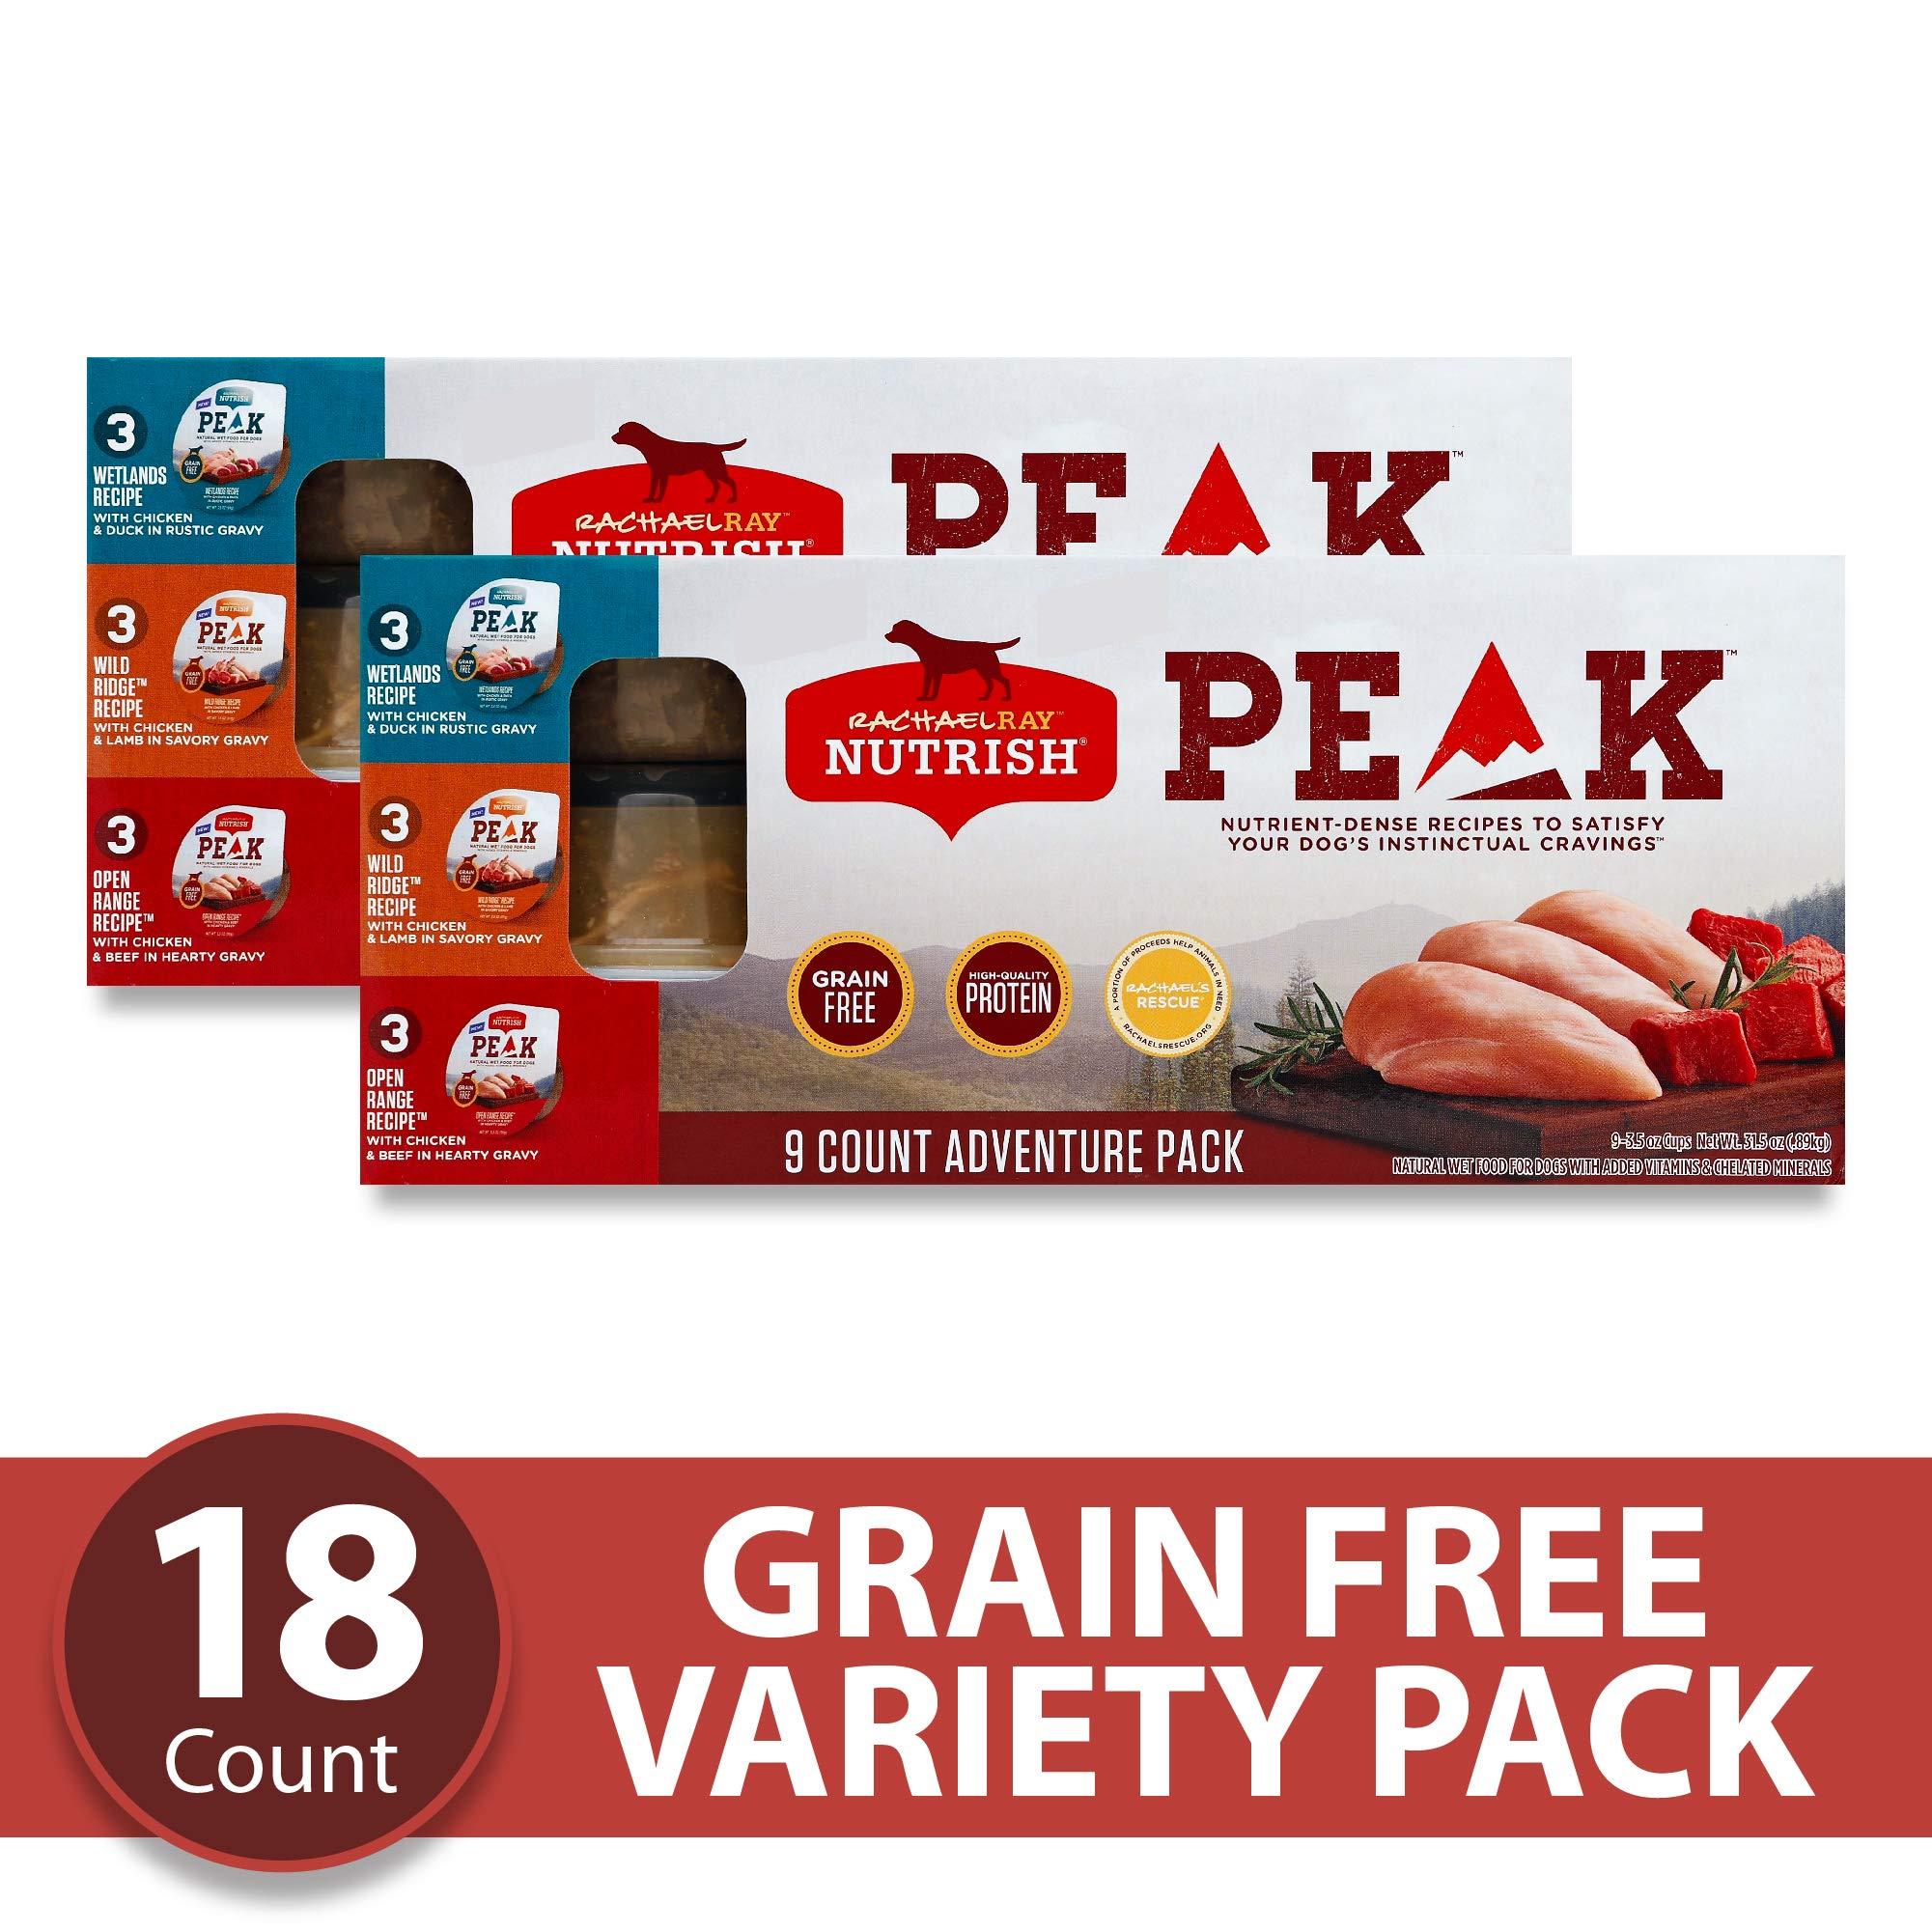 Rachael Ray Nutrish PEAK Natural Premium Wet Dog Food Variety Pack, Grain Free Adventure Pack, 3.5 Oz. Tub (Pack Of 18) by Rachael Ray Nutrish